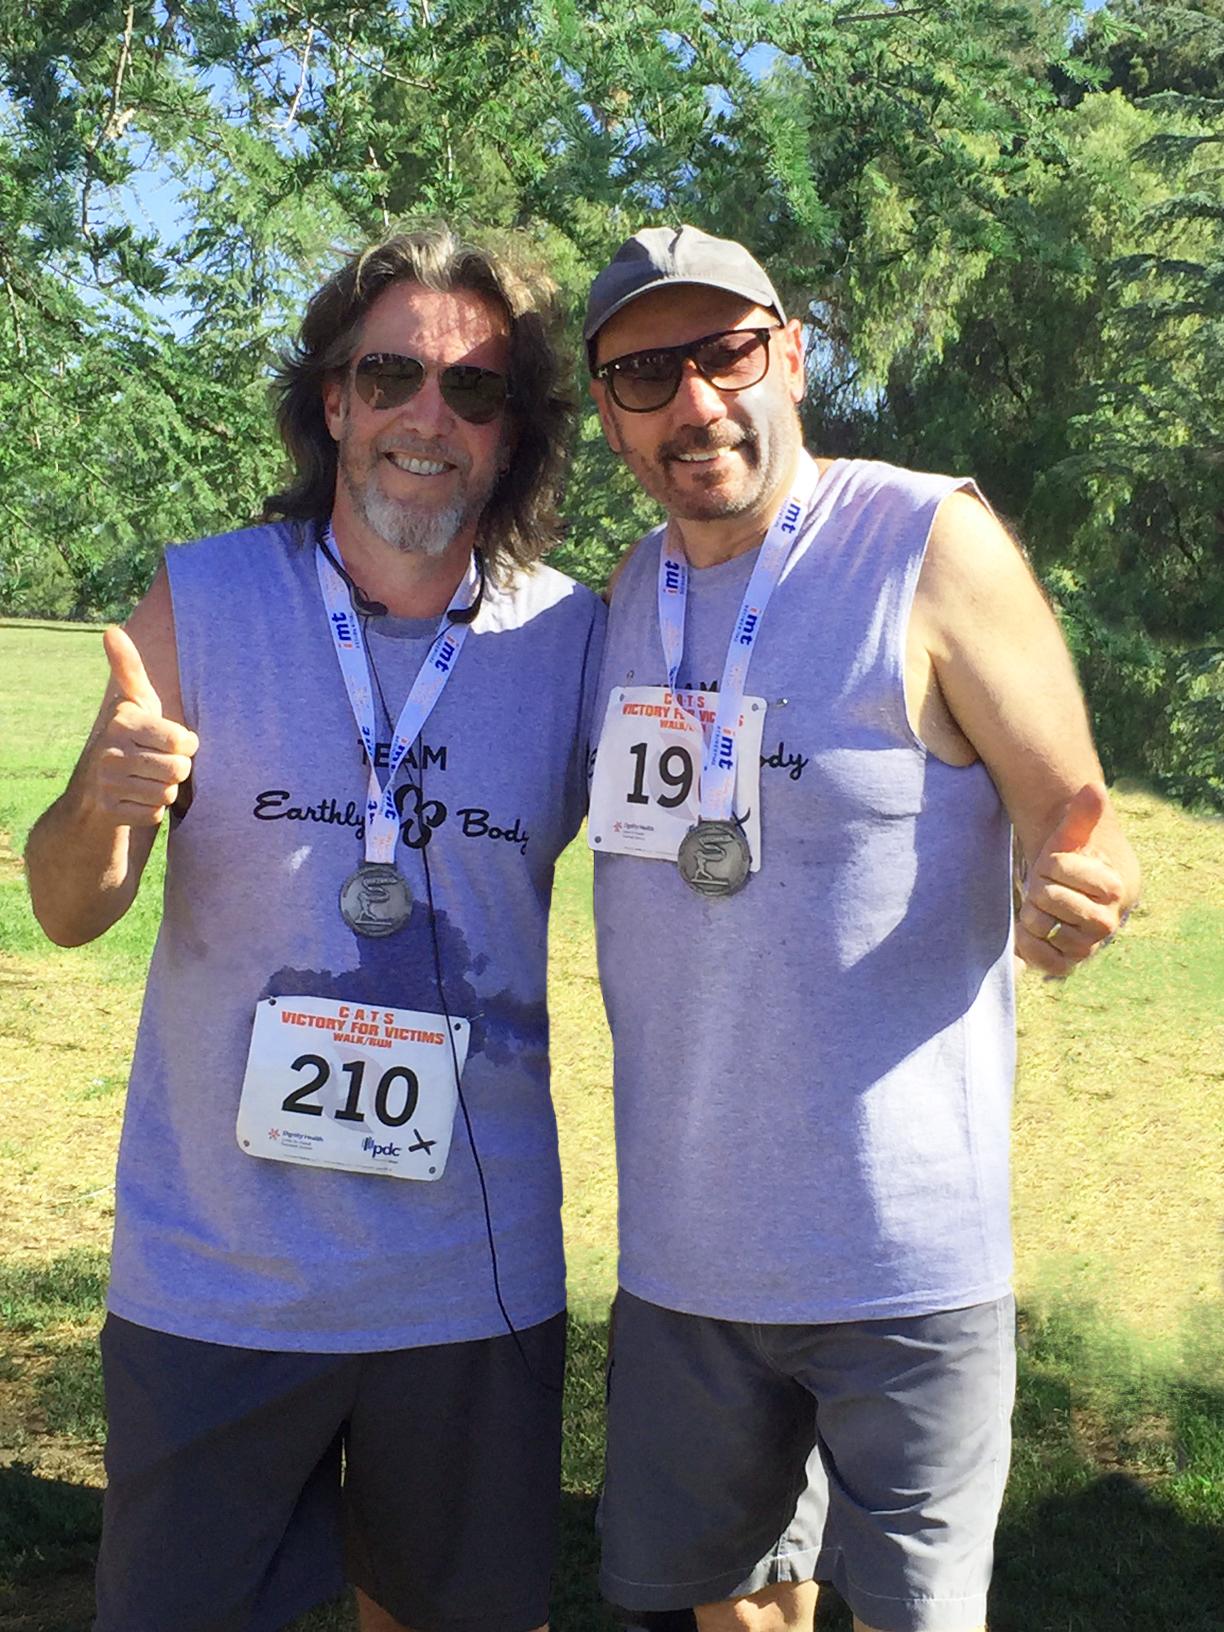 Kevin Wachs and Steve Goddard